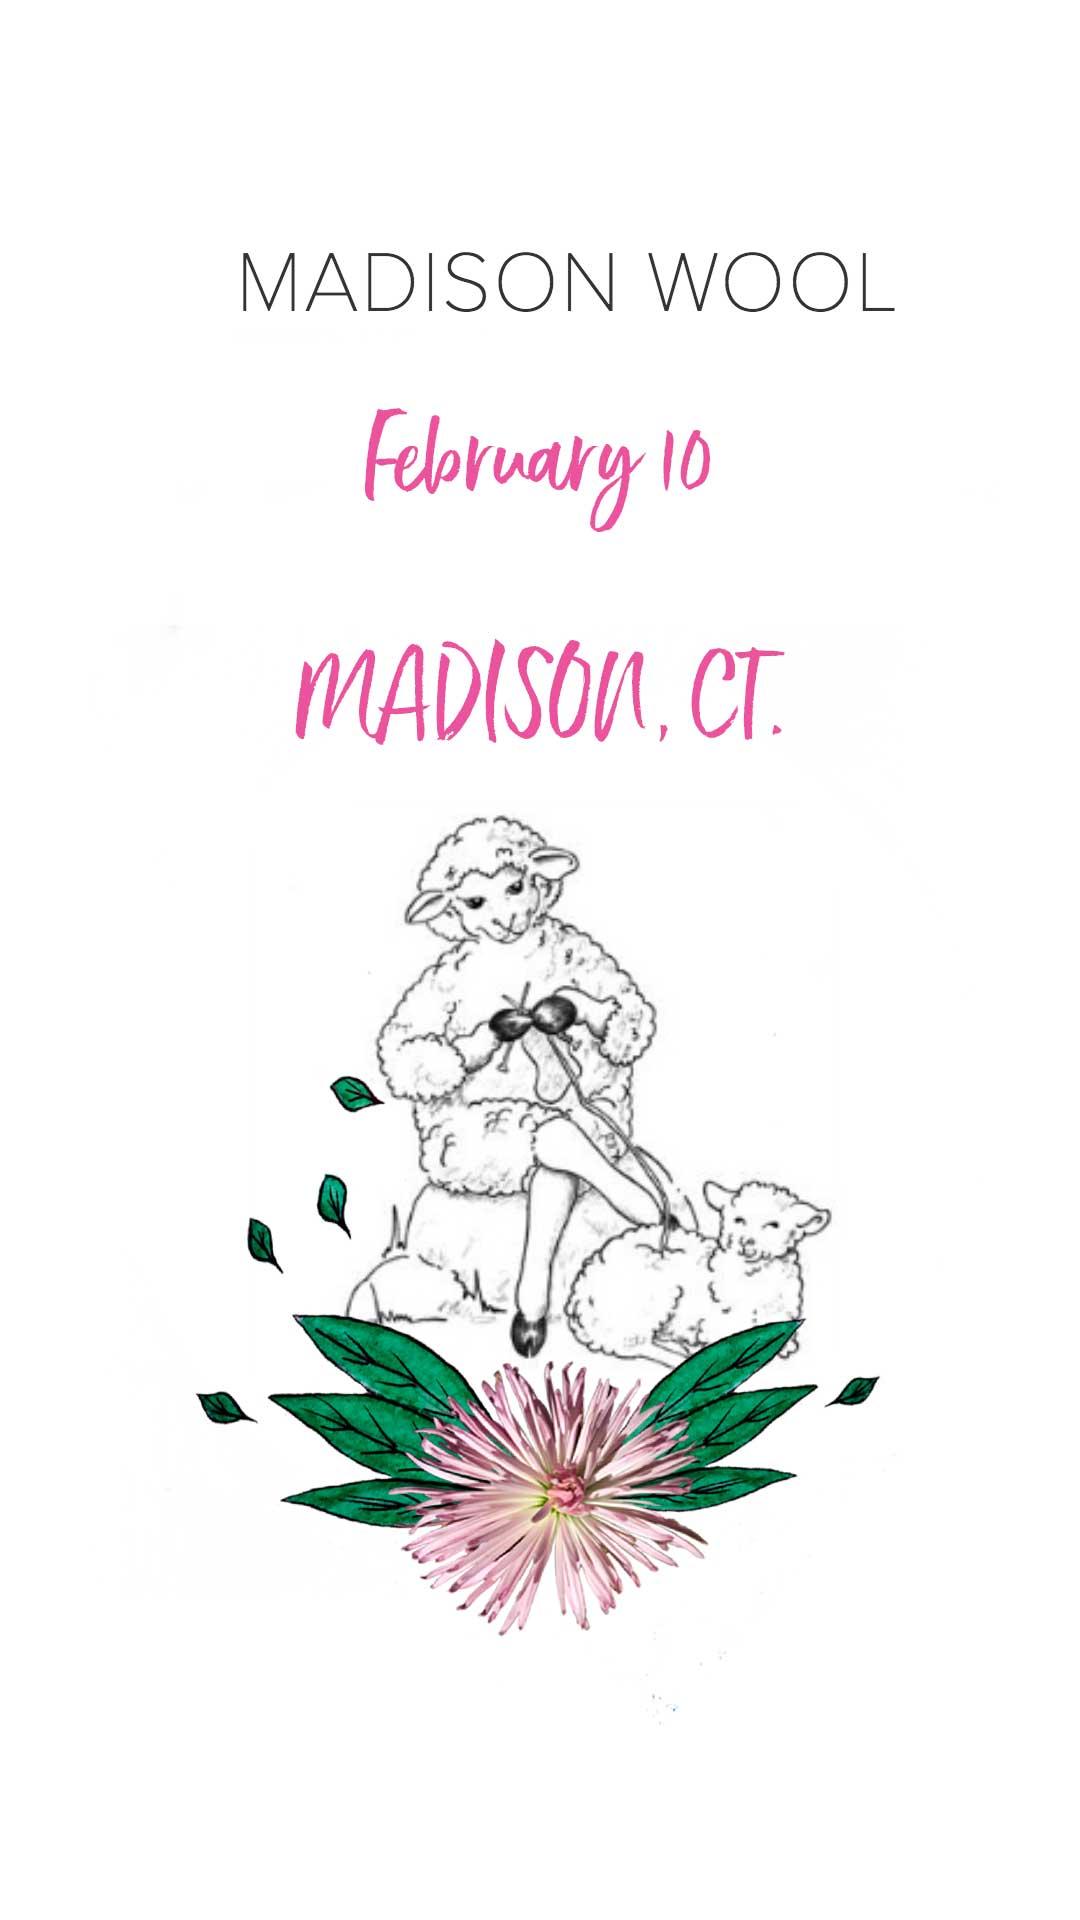 Madison Wool Madison, CT